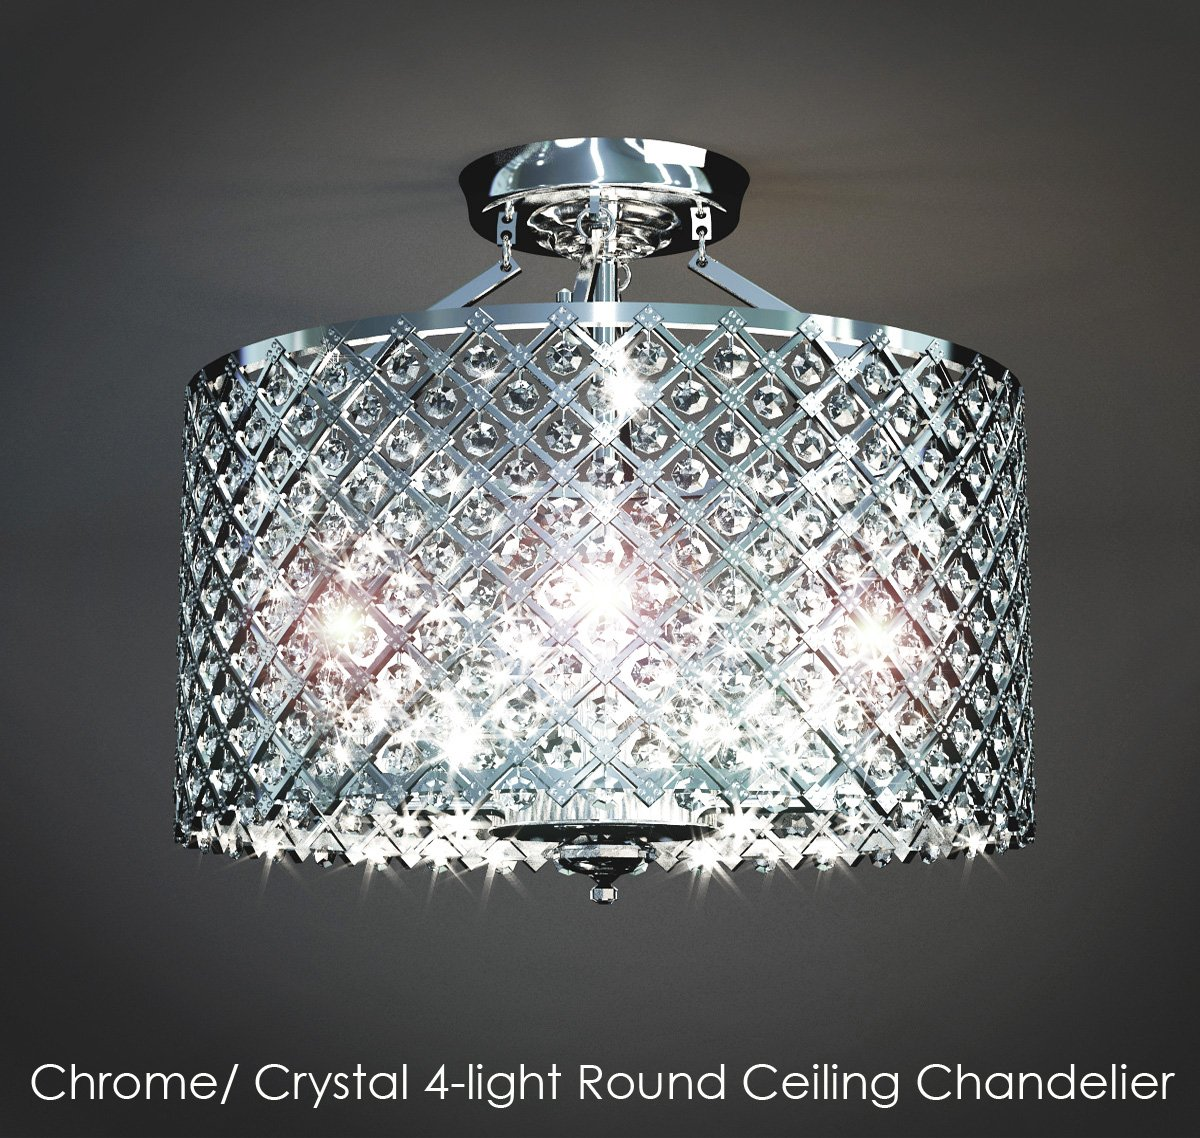 Chromecrystal 4light Round Ceiling Chandelier Model In Lights Export